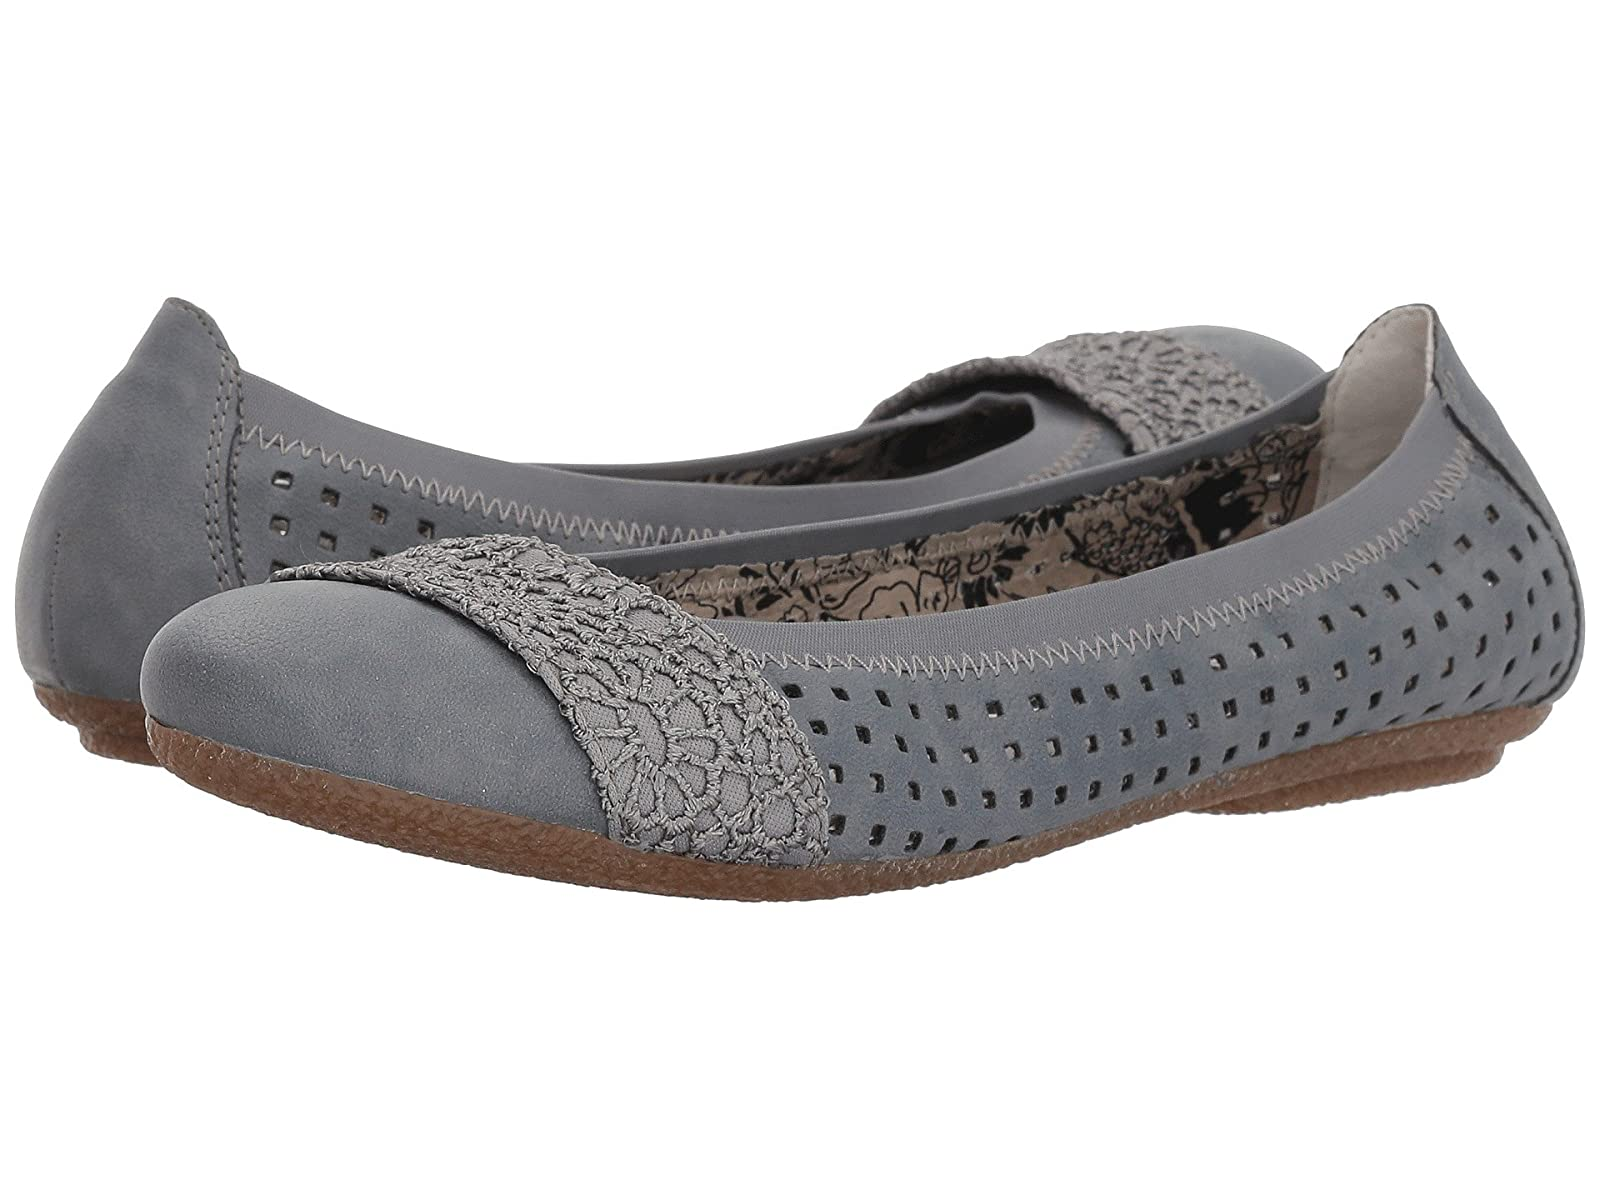 Rieker 41487 Savannah 87Cheap and distinctive eye-catching shoes